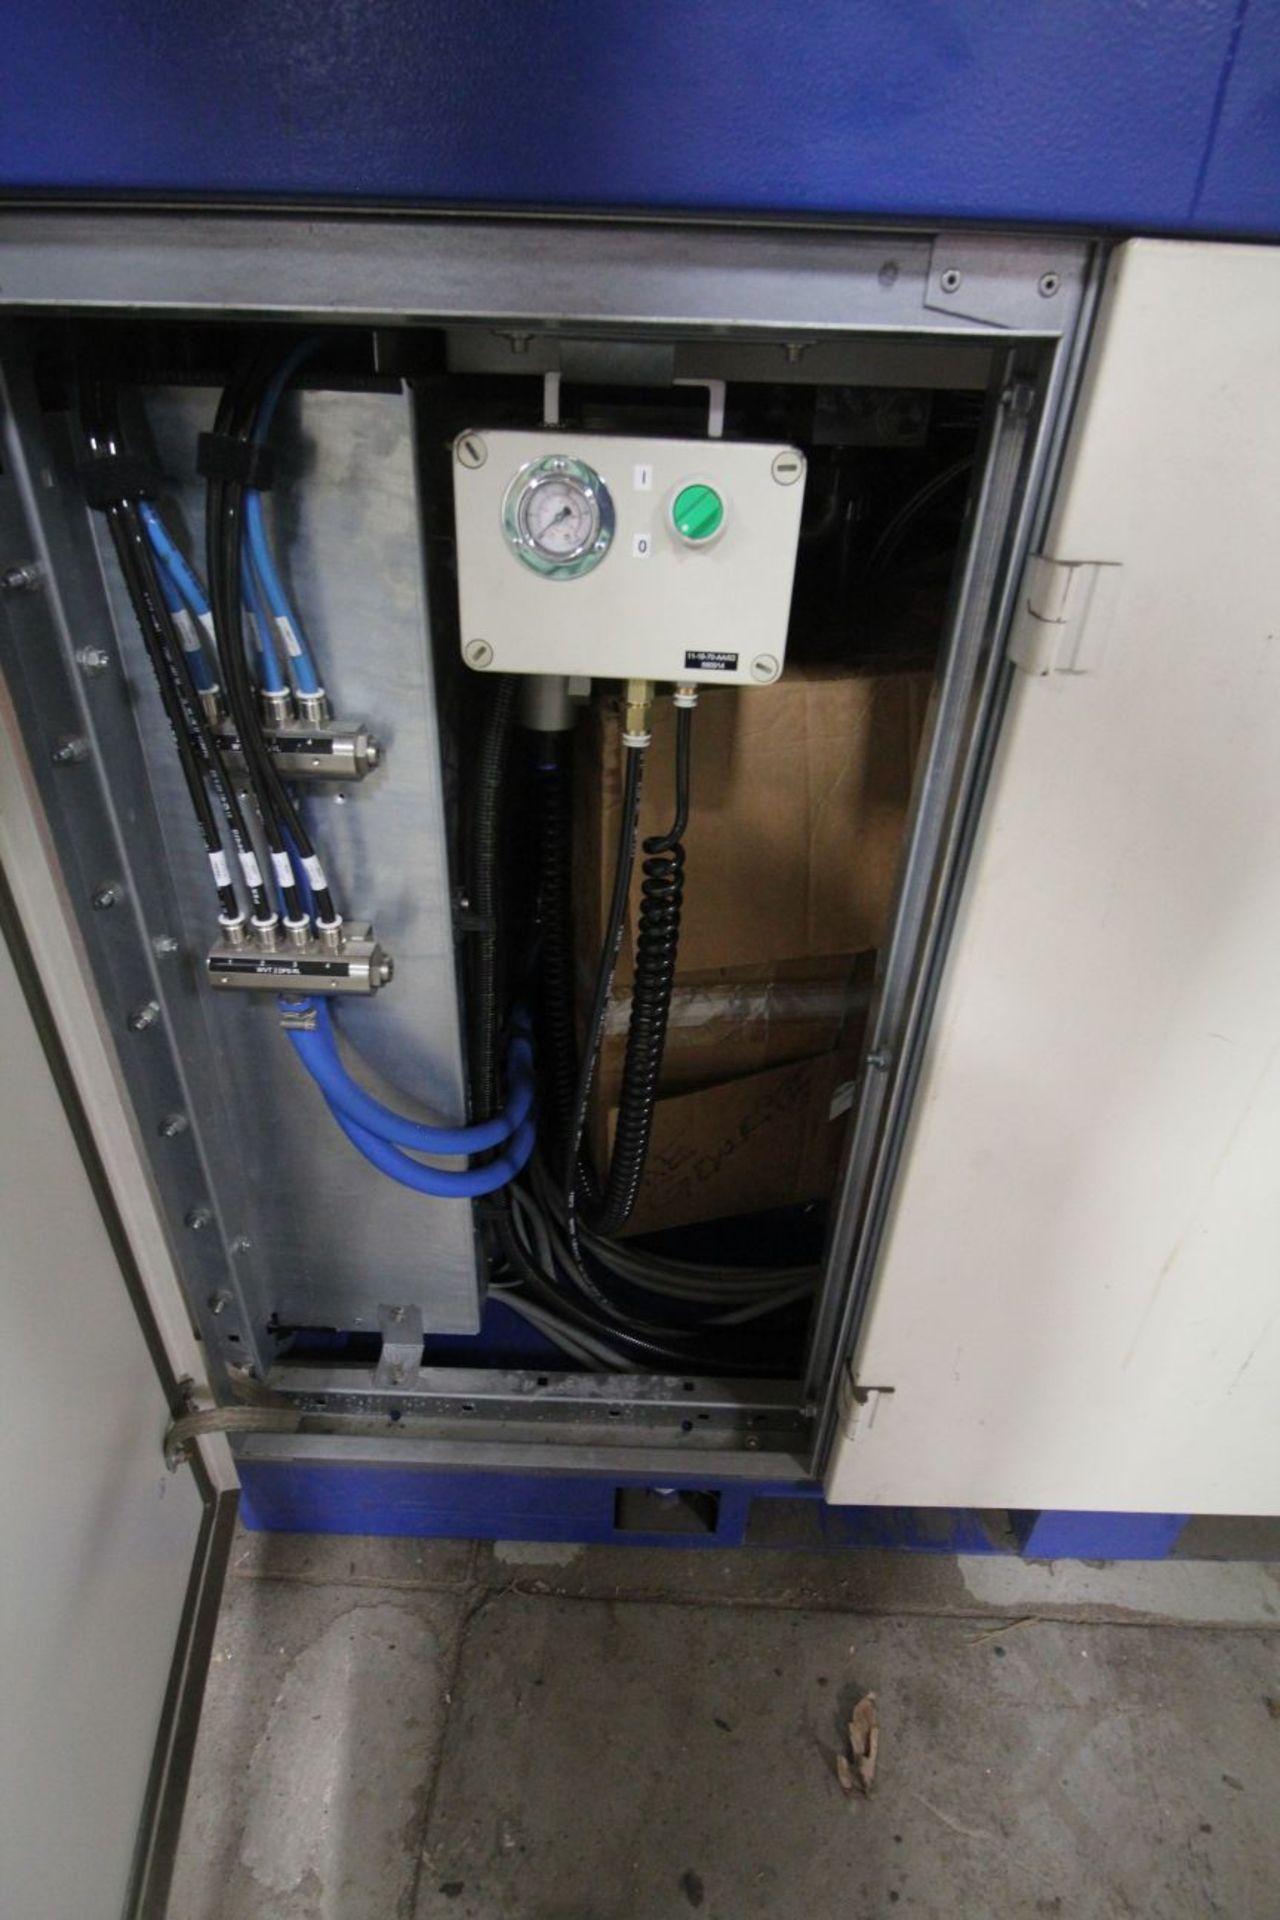 Lot 4 - ABB/TRUMPF ROBOTIC DUAL TRUNNION LASER CUTTING CELL, ABB 2400/16 & TUMPF TRUDISK 8002 LASER, 2007